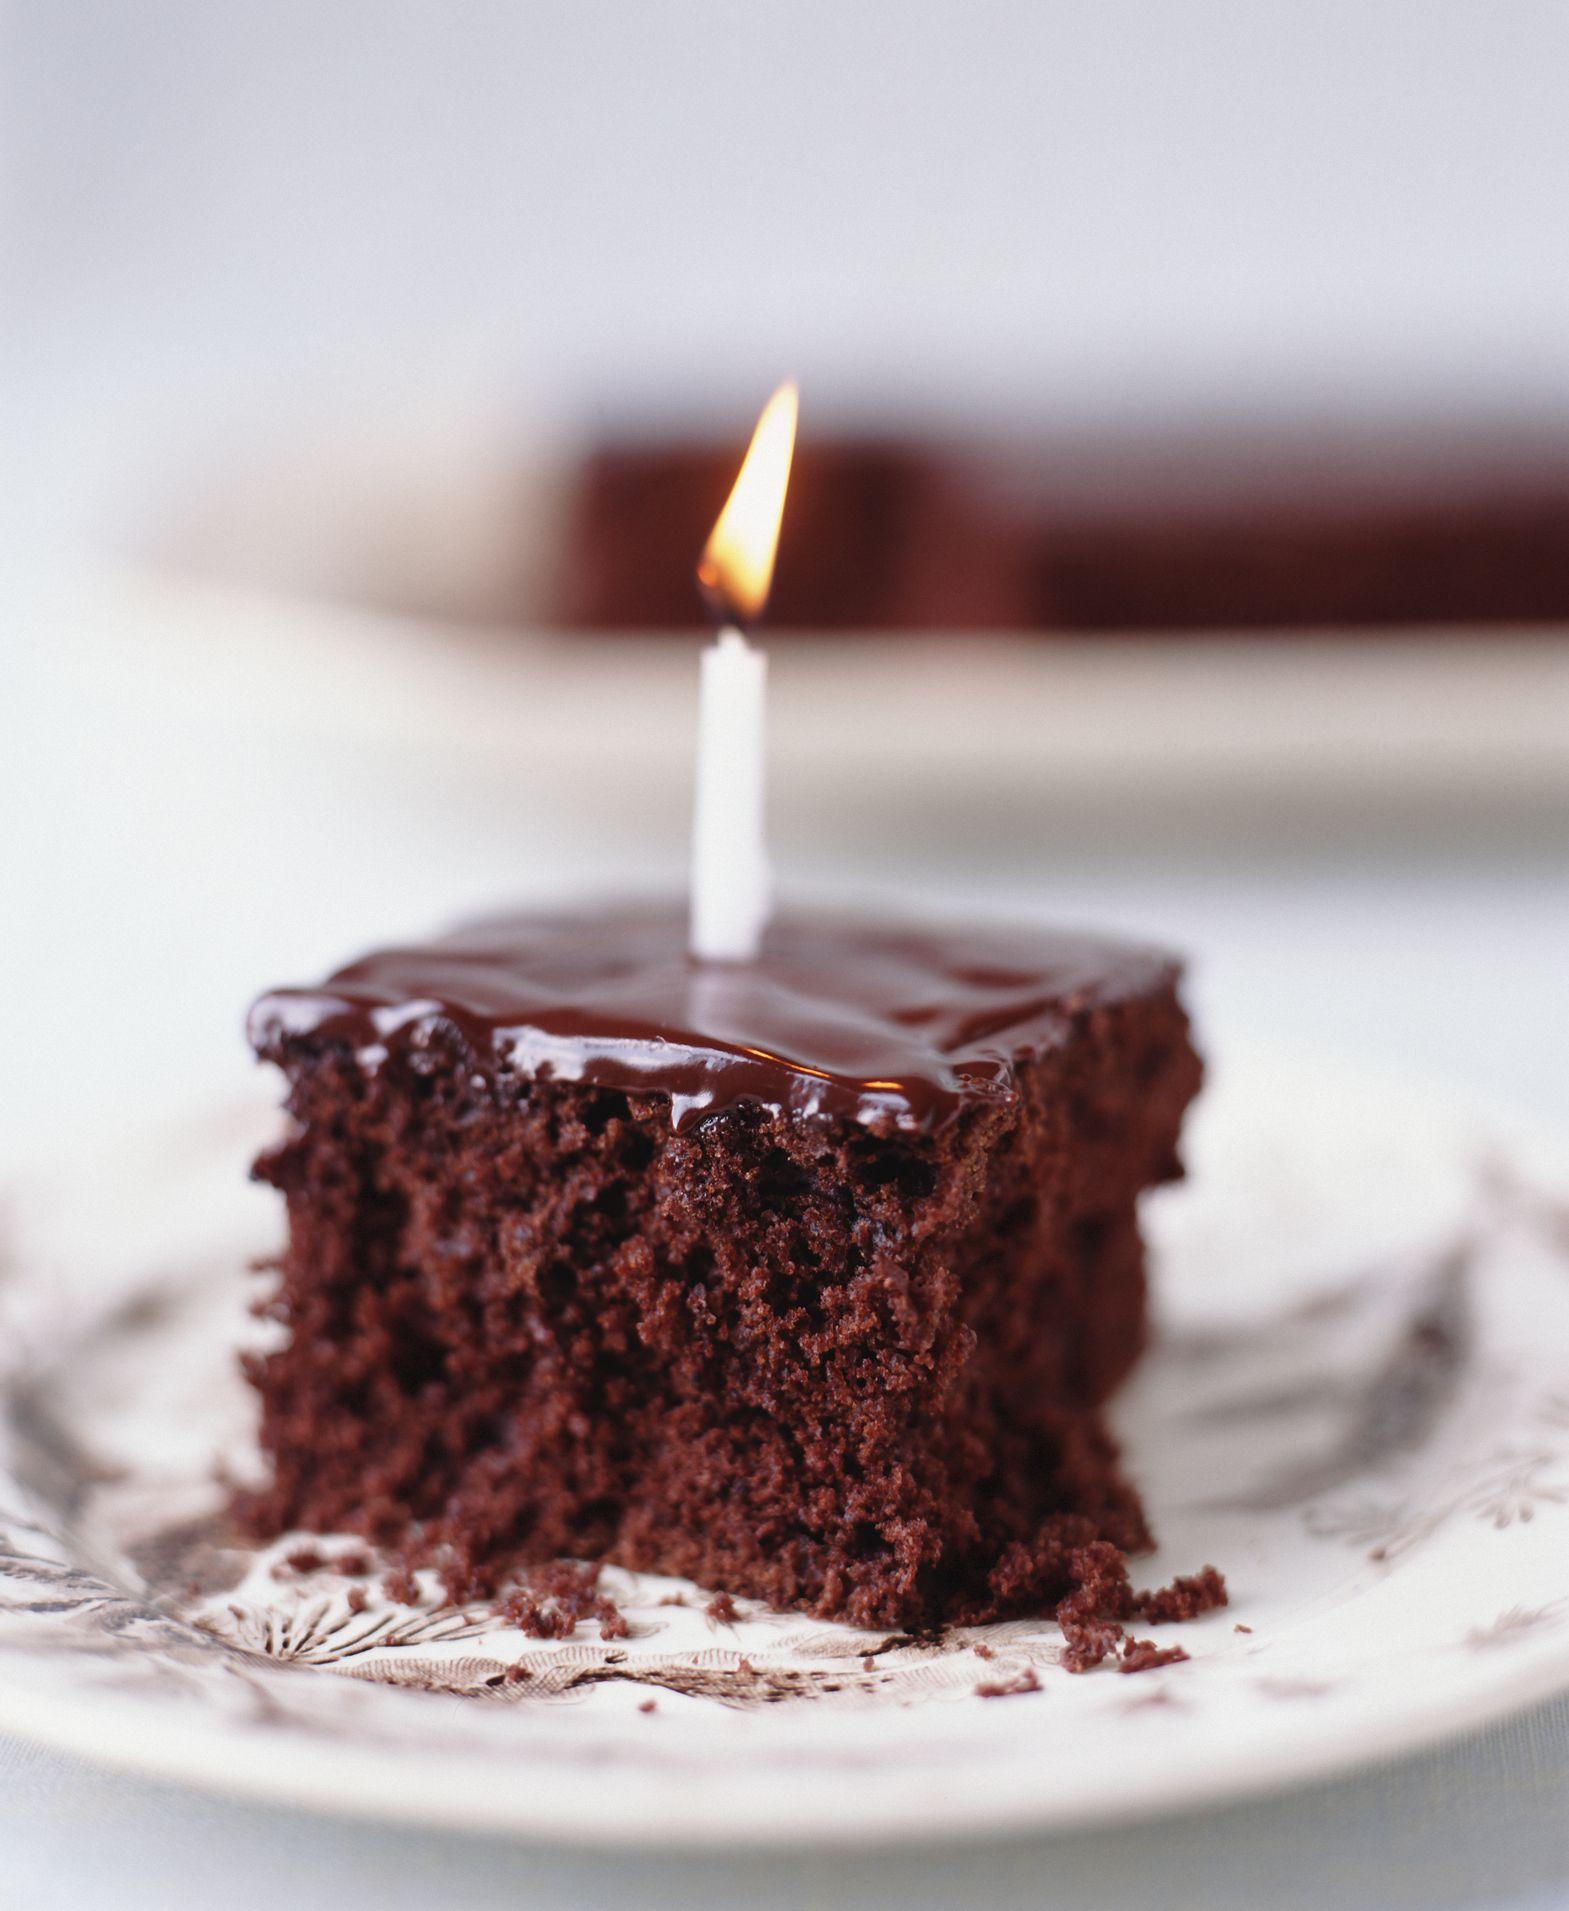 Low Fat Chocolate Cake Recipe Applesauce